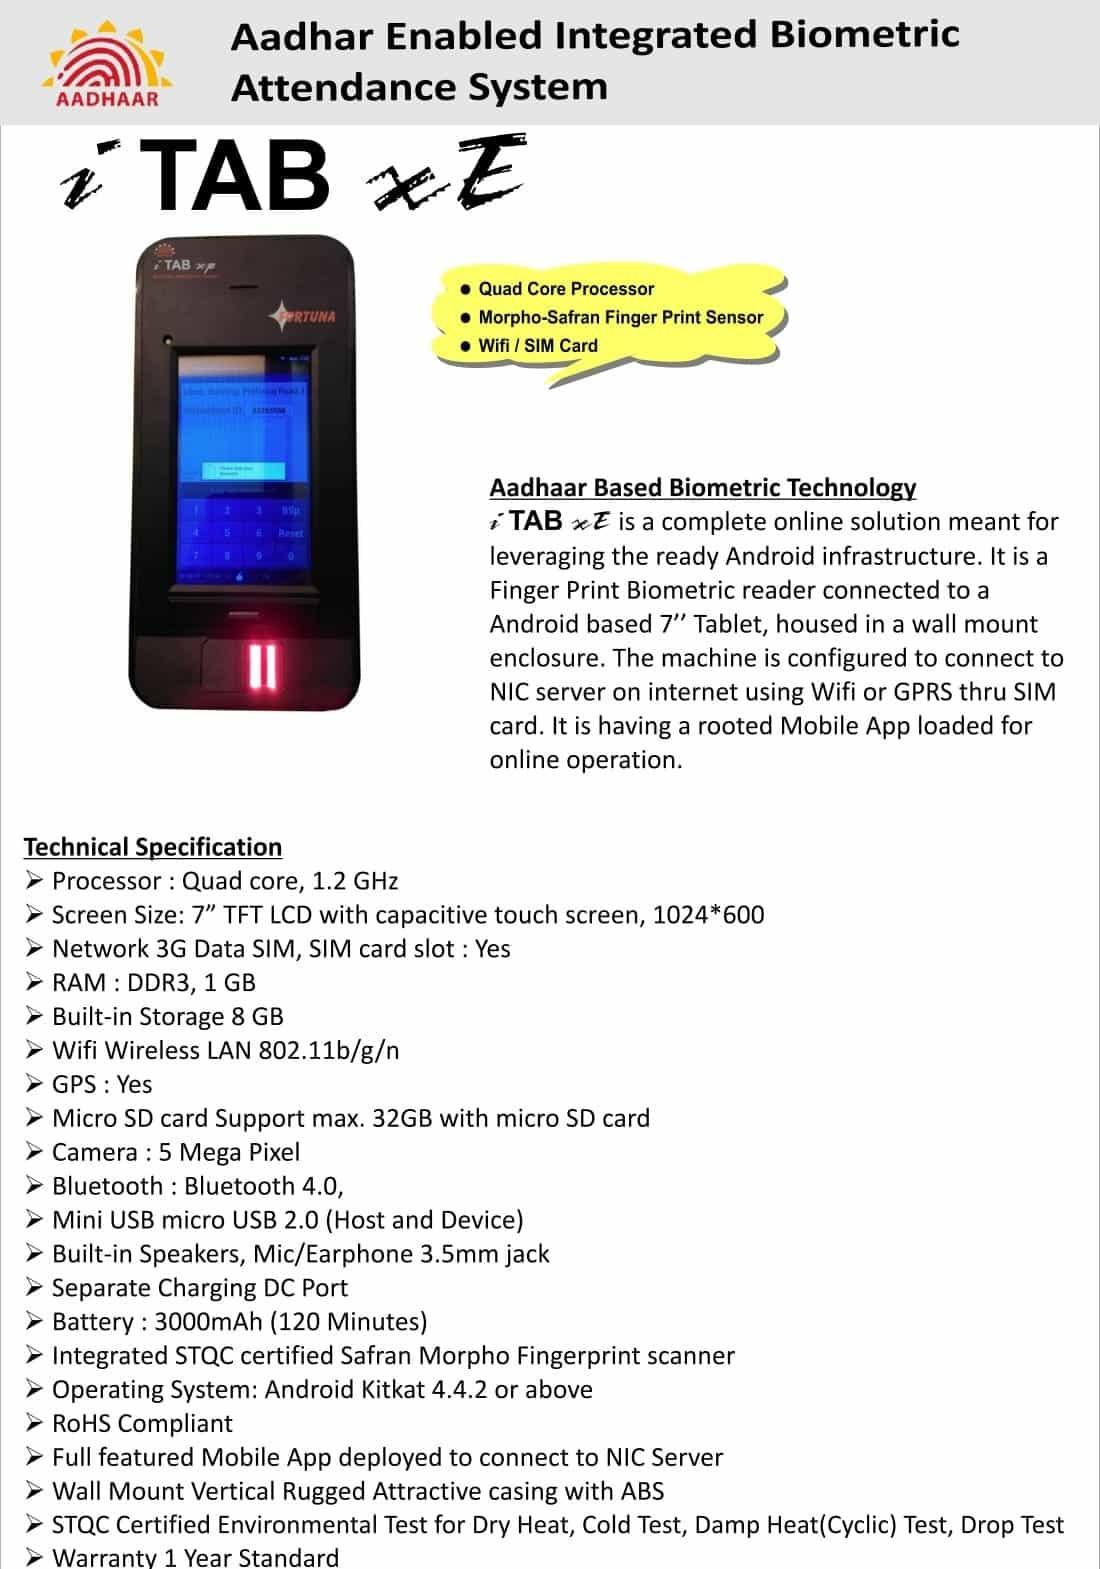 Aadhaar Enabled biometric attendance system iTAB xE Catalog